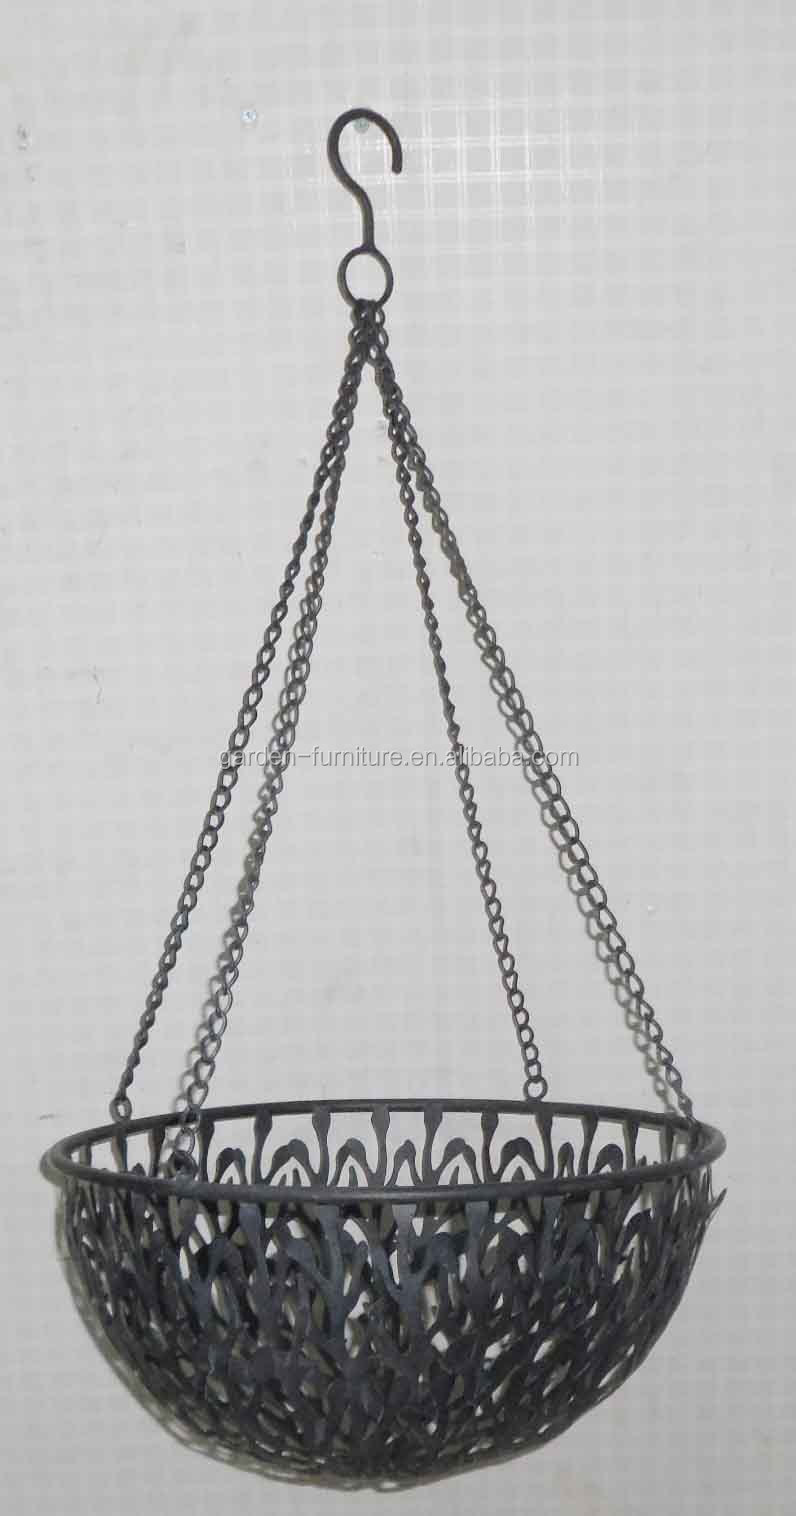 Wholesale Garden Planter Holders Handicraft Antique Hanging Wire ...